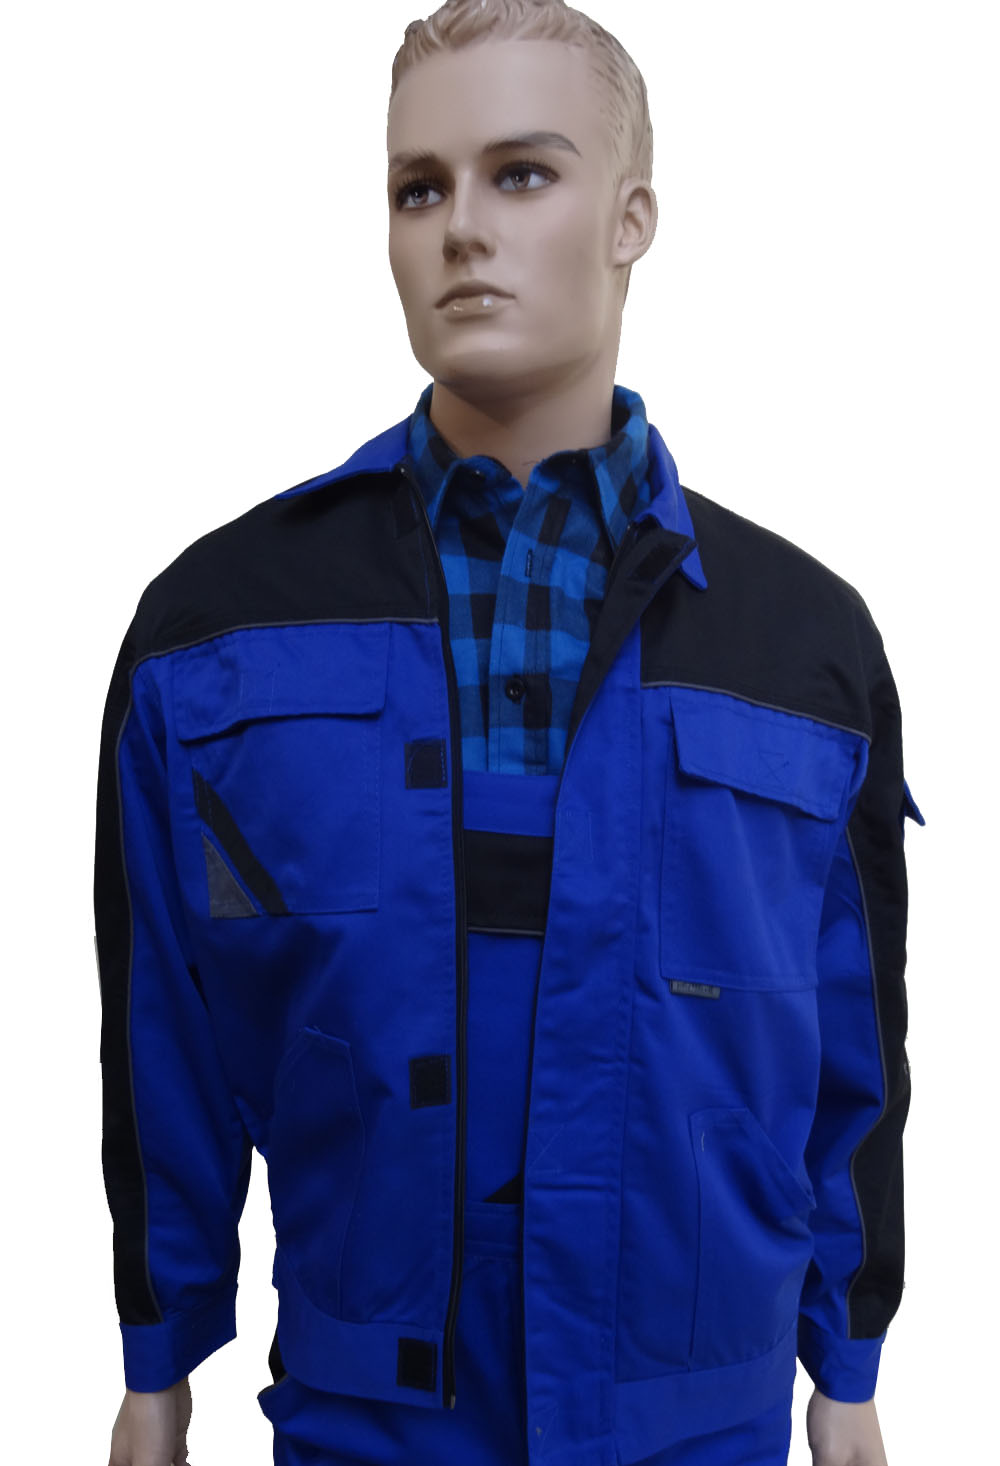 34e44bcb Bluza robocza PROFESSIONAL niebieska60/188/114-118 - 6830808700 ...